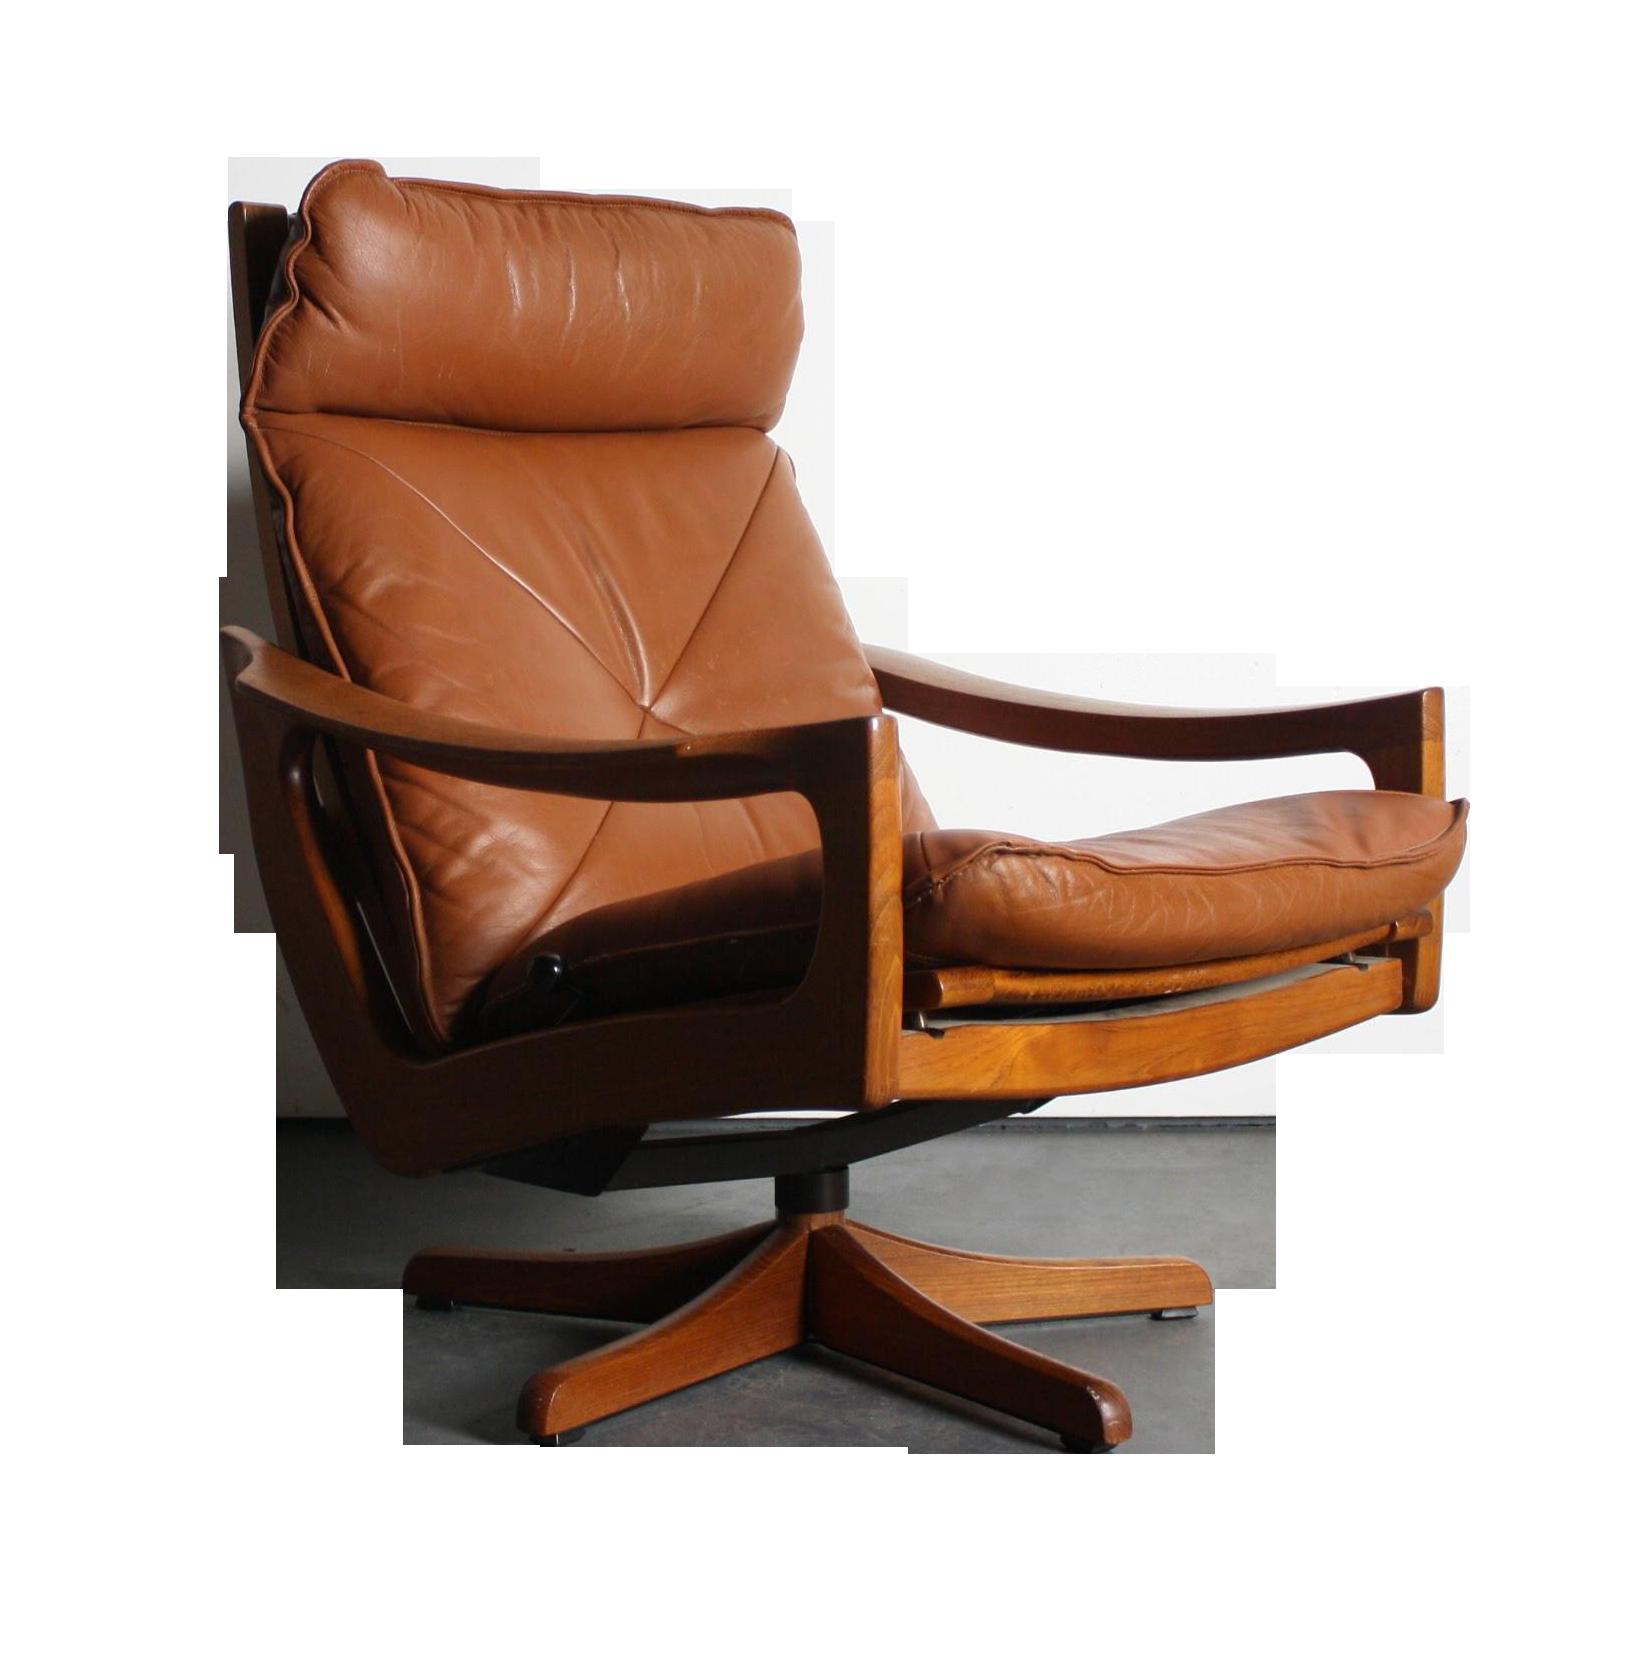 norwegian vintage office chair. Vintage Norwegian Leather Reclining Chair Office